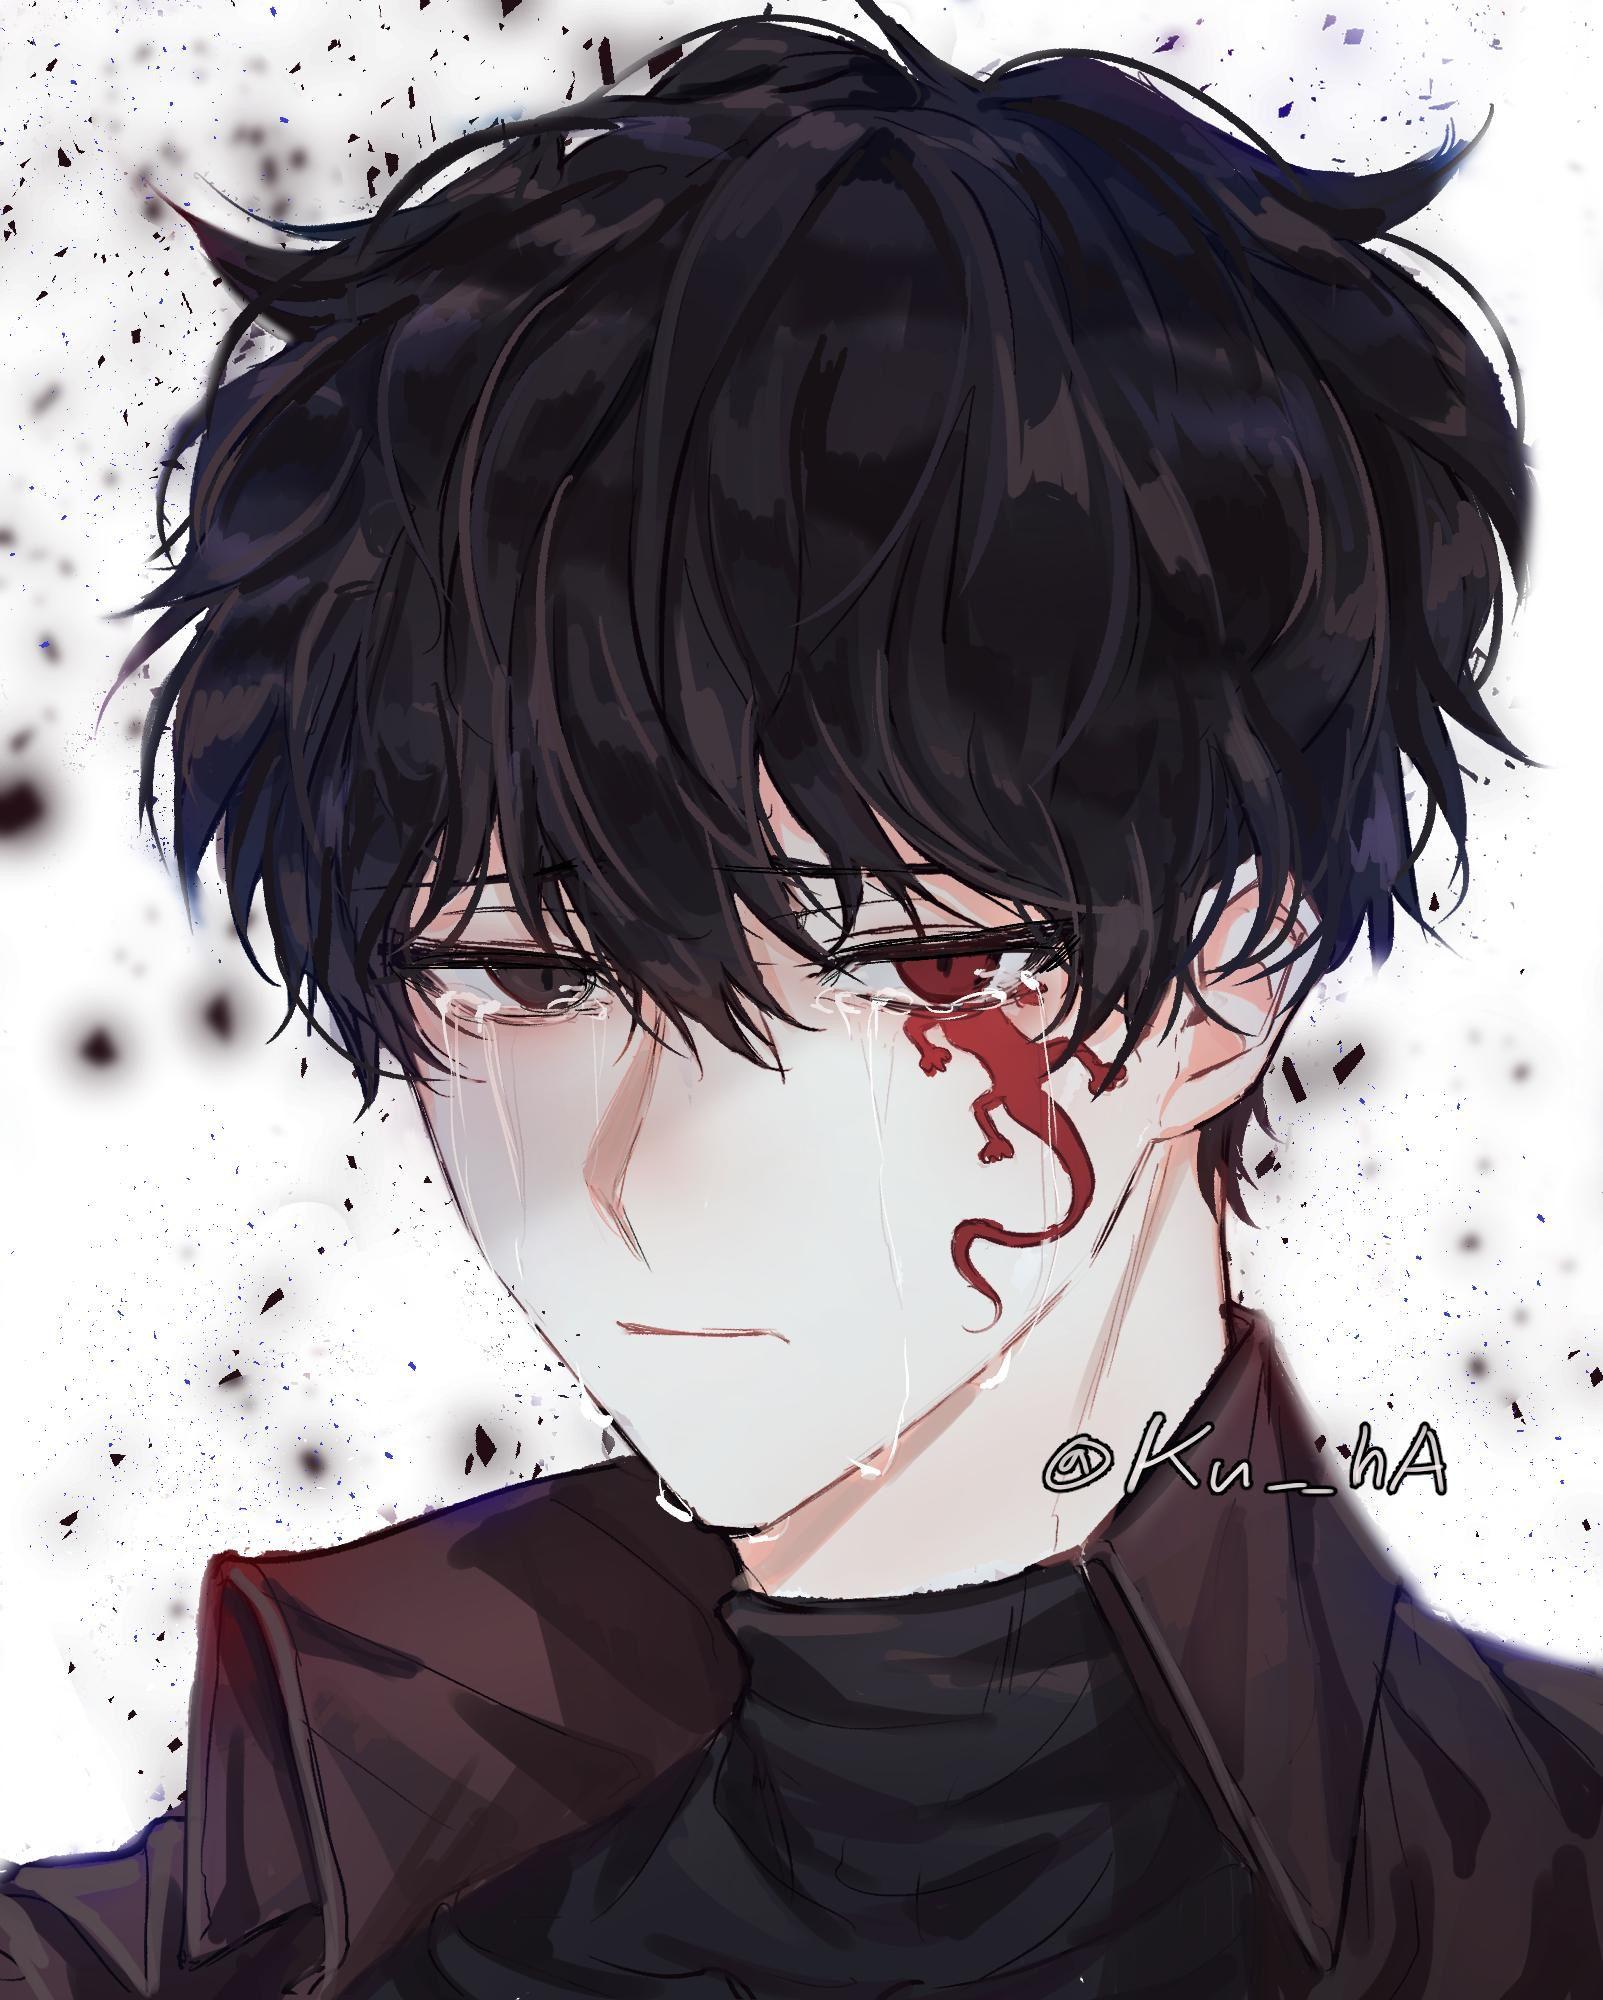 Pin By Nightgy Army On Unie Anime Drawings Boy Cute Anime Guys Dark Anime